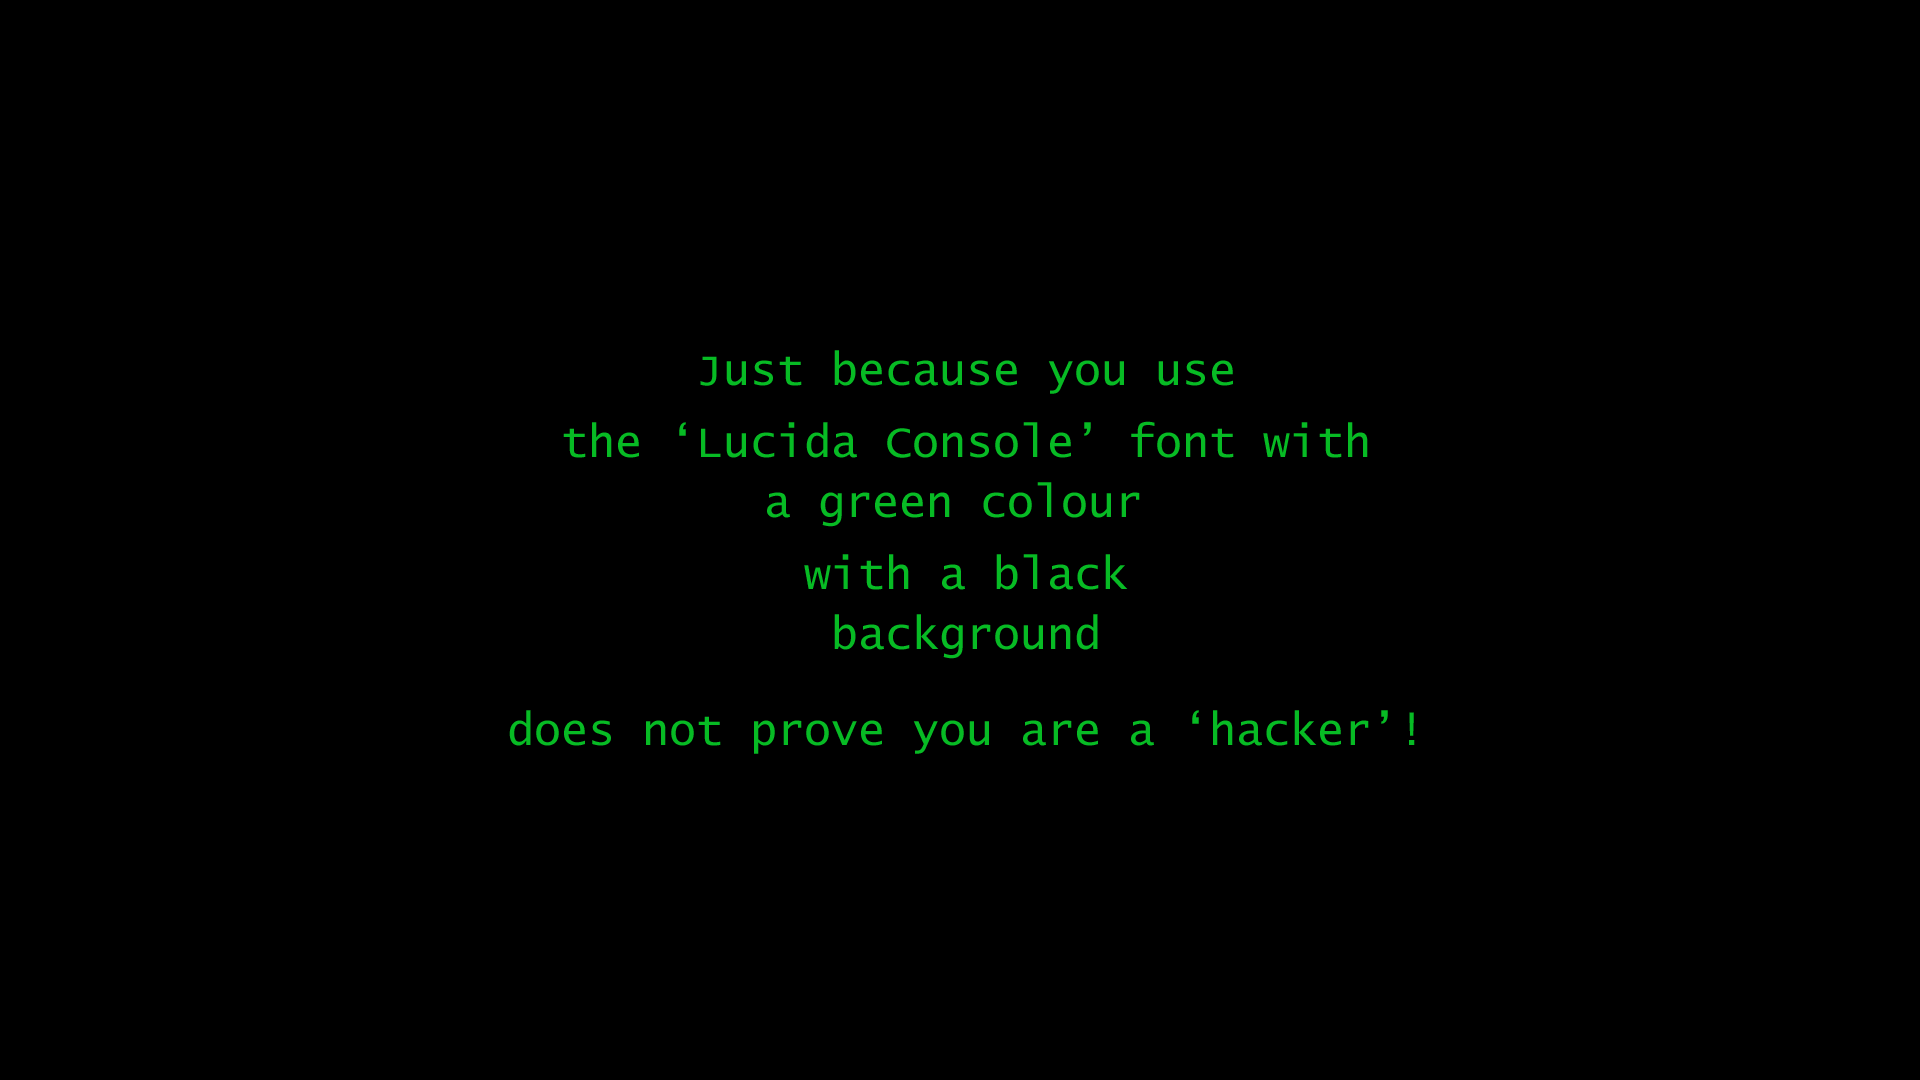 black hat hackers wallpaper - photo #13